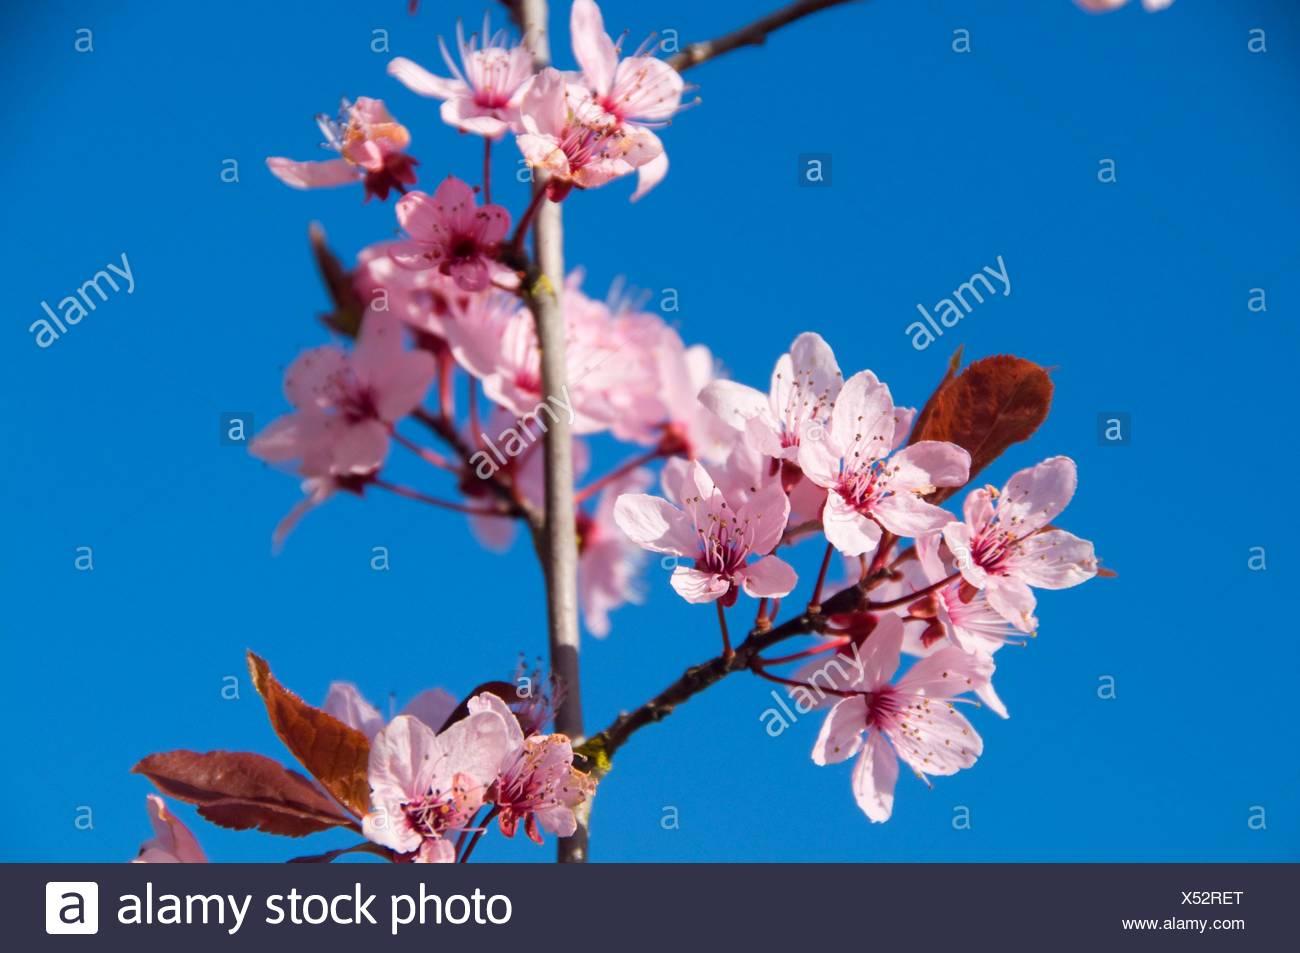 Plum blossoms, Marshall Unit-Willamette River Greenway, Lane County, Oregon. - Stock Image